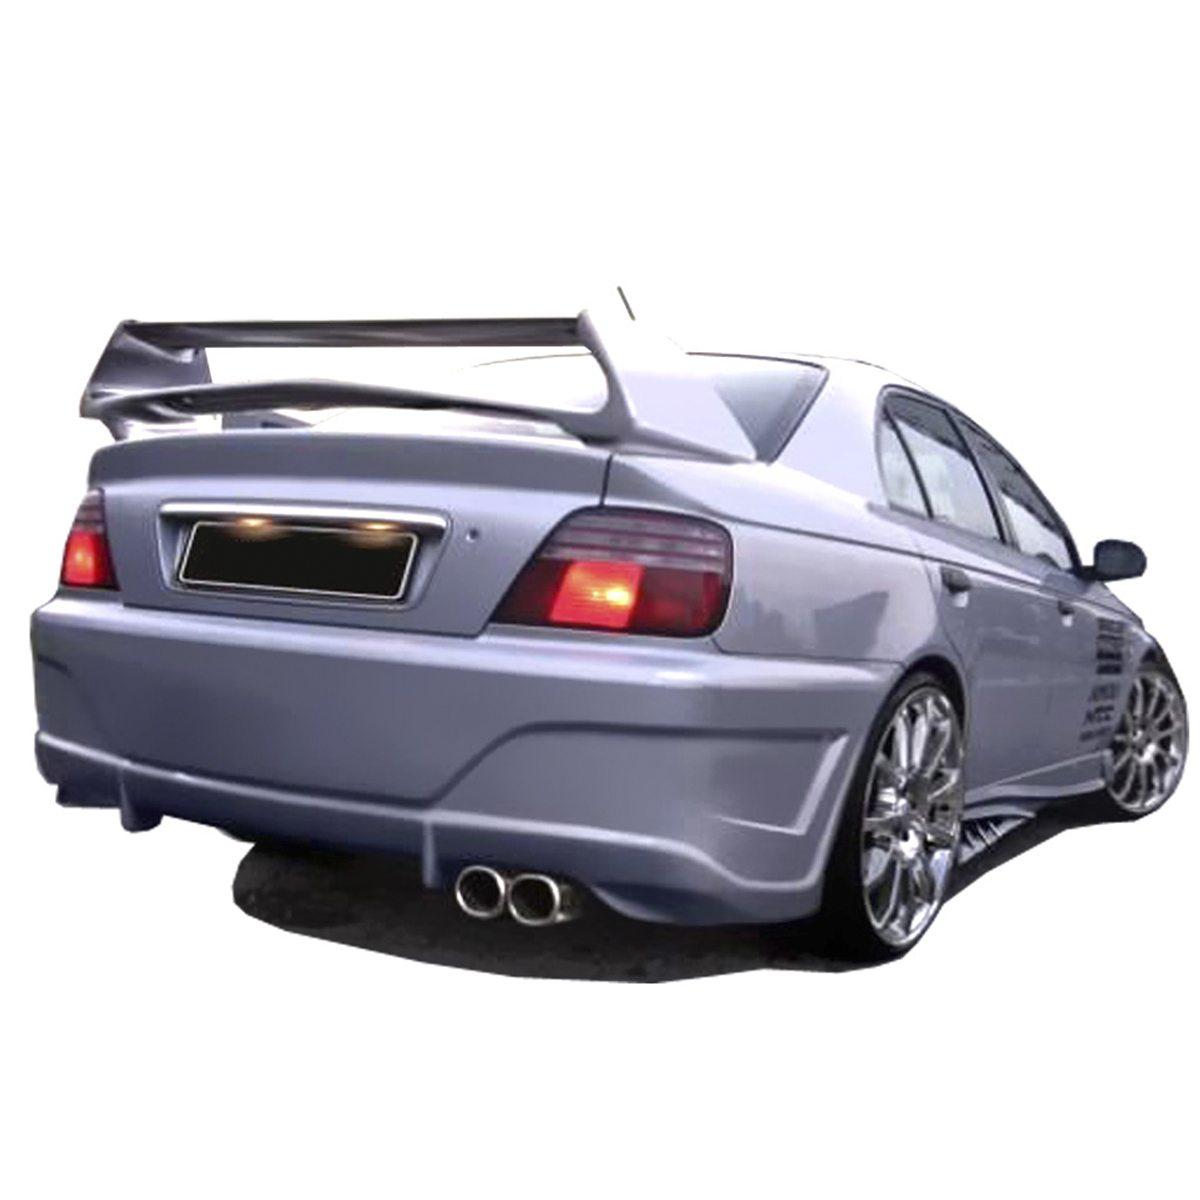 Honda-Accord-98-03-Tras-PCS088